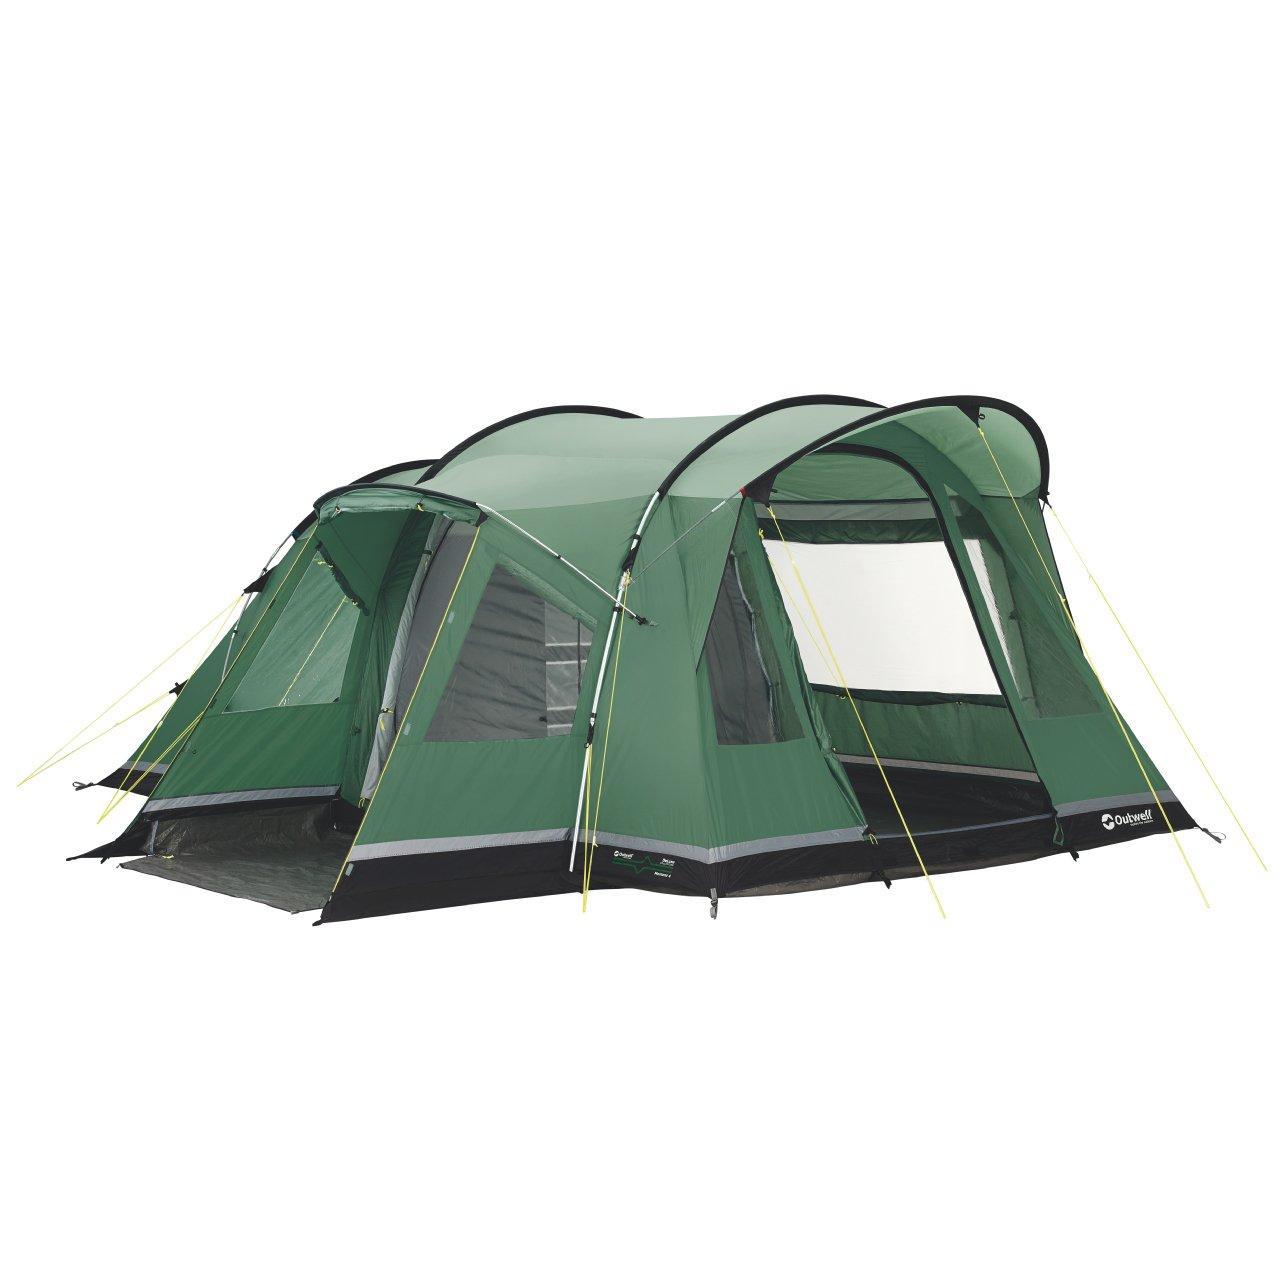 OUTWELL Montana 4 Man Tent  sc 1 st  Blacks & OUTWELL Montana 4 Man Tent | Blacks